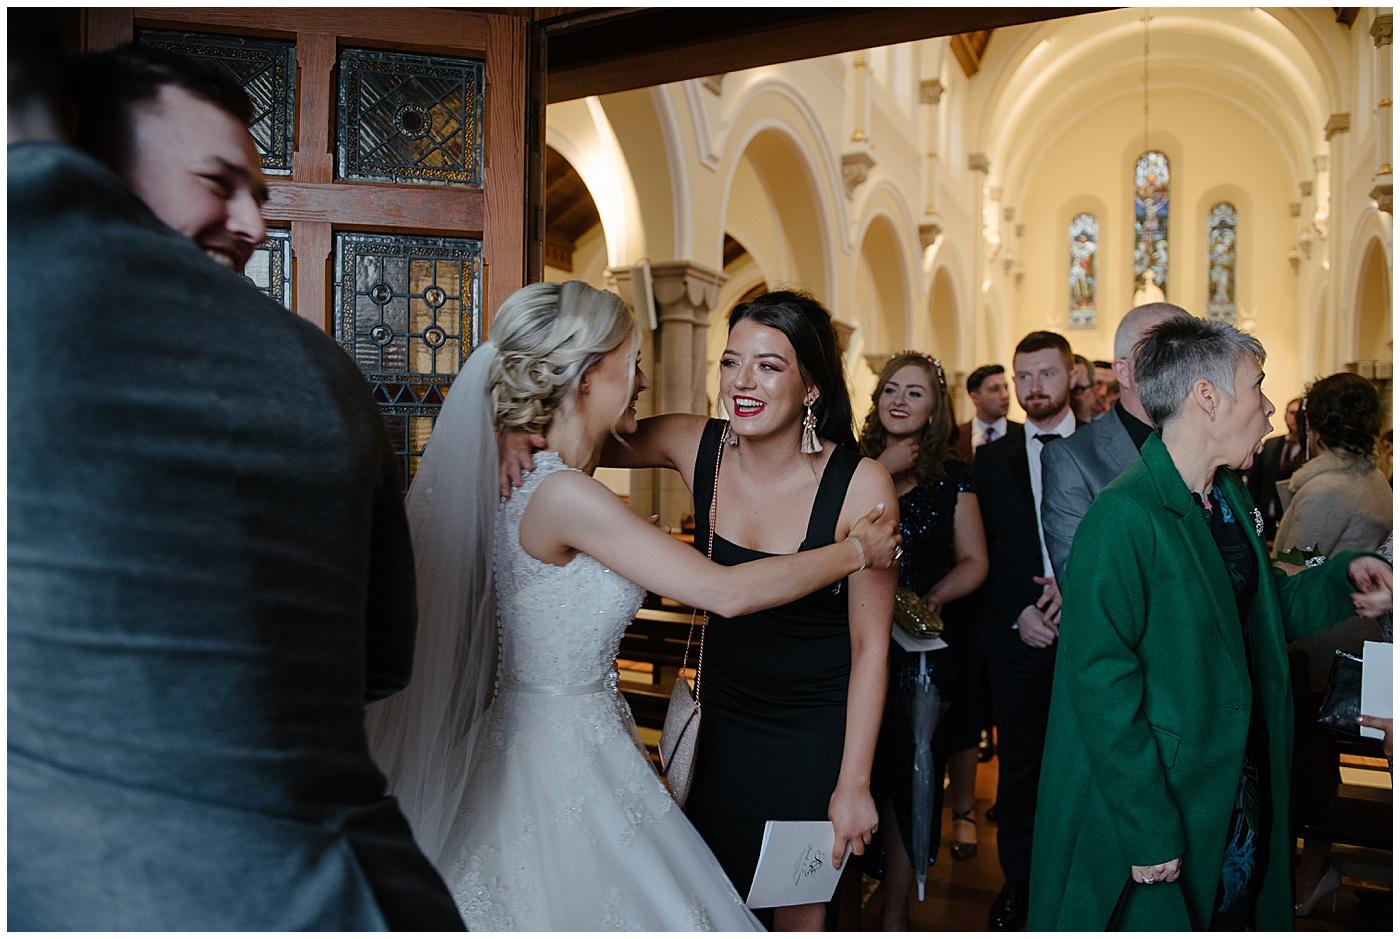 lissan-house-wedding-jude-browne-photography_0052.jpg